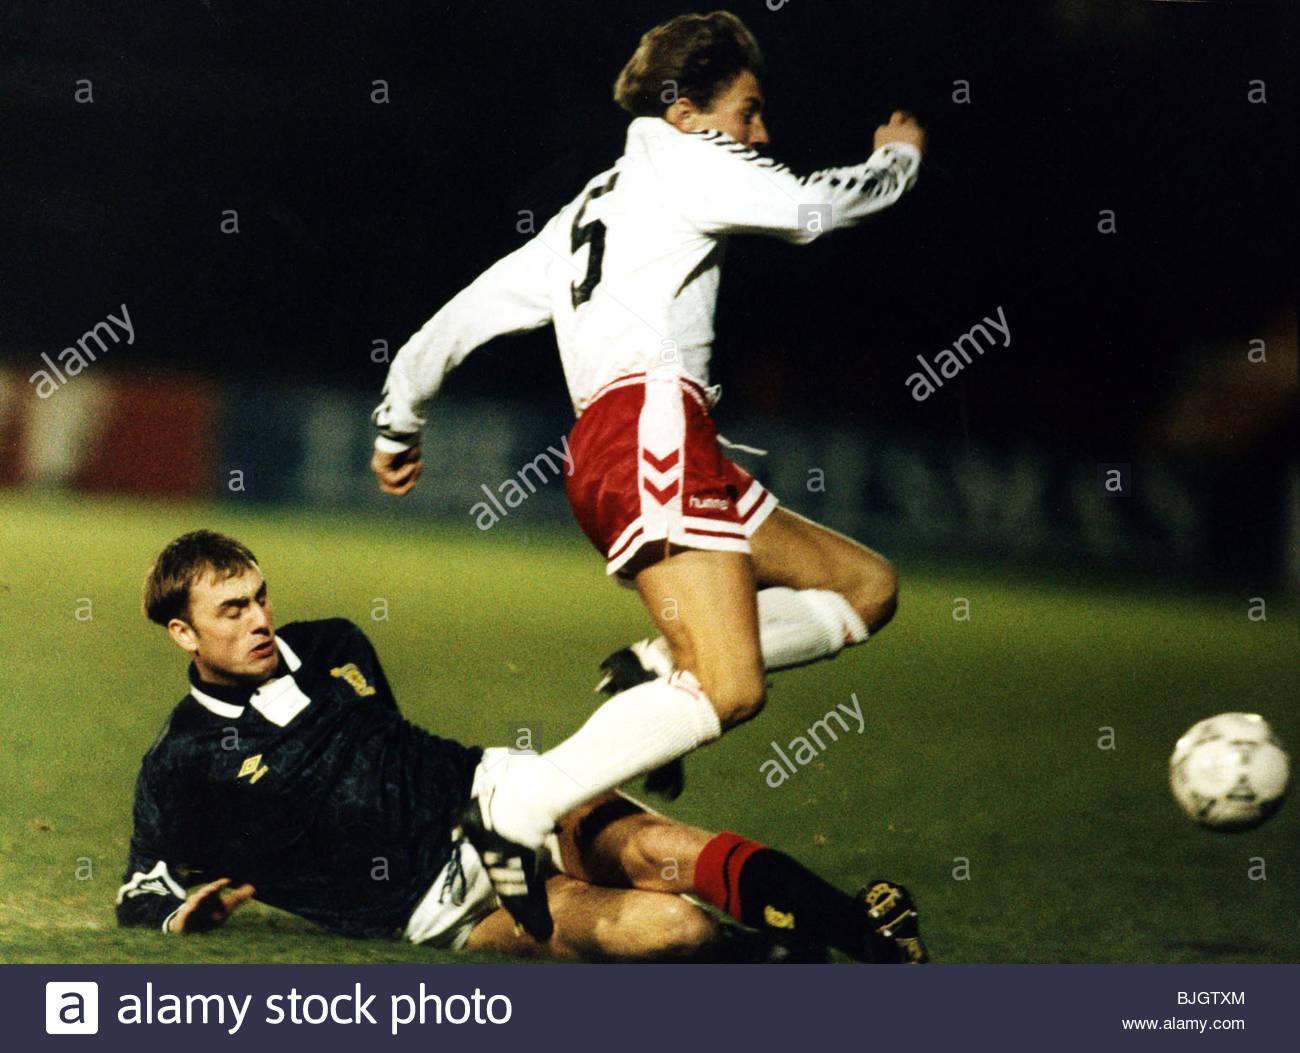 18/02/92 UNDER 21 INTERNATIONAL FRIENDLY SCOTLAND U21 V DENMARK U21 (3-0) EASTER ROAD - EDINBURGH Scotland's - Stock Image